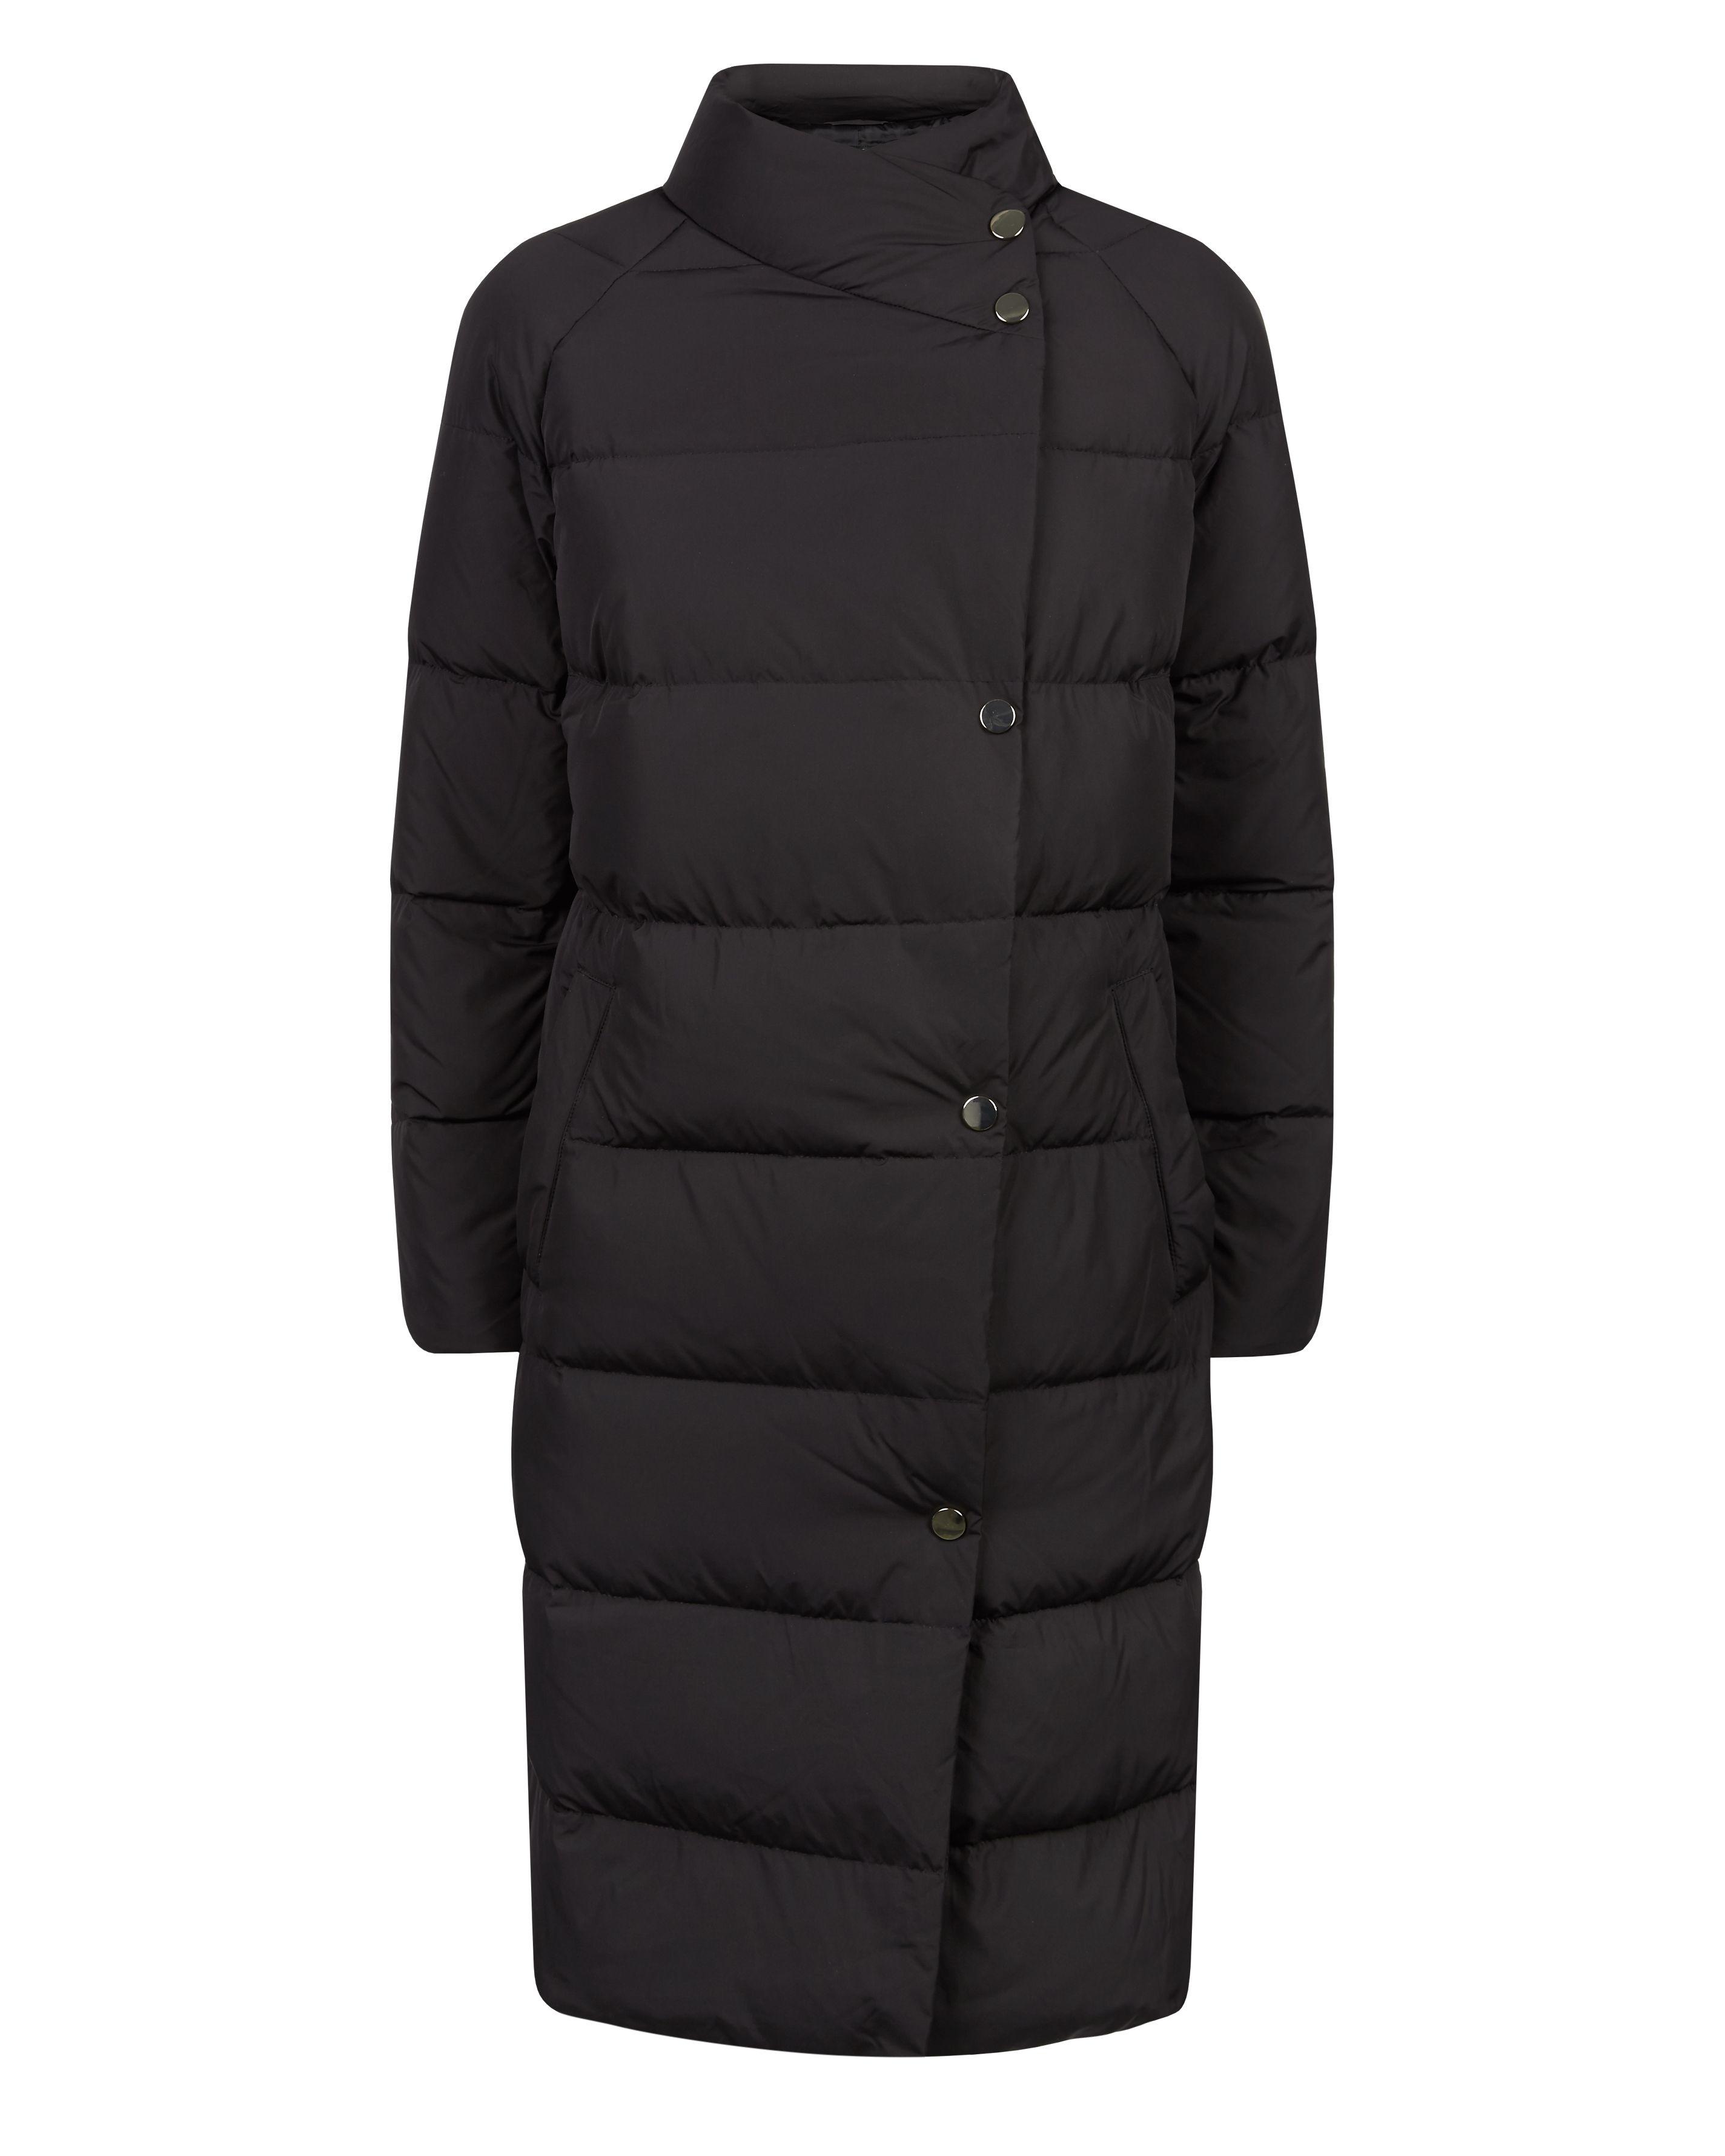 Jaeger Asymmetric Puffer Coat in Black